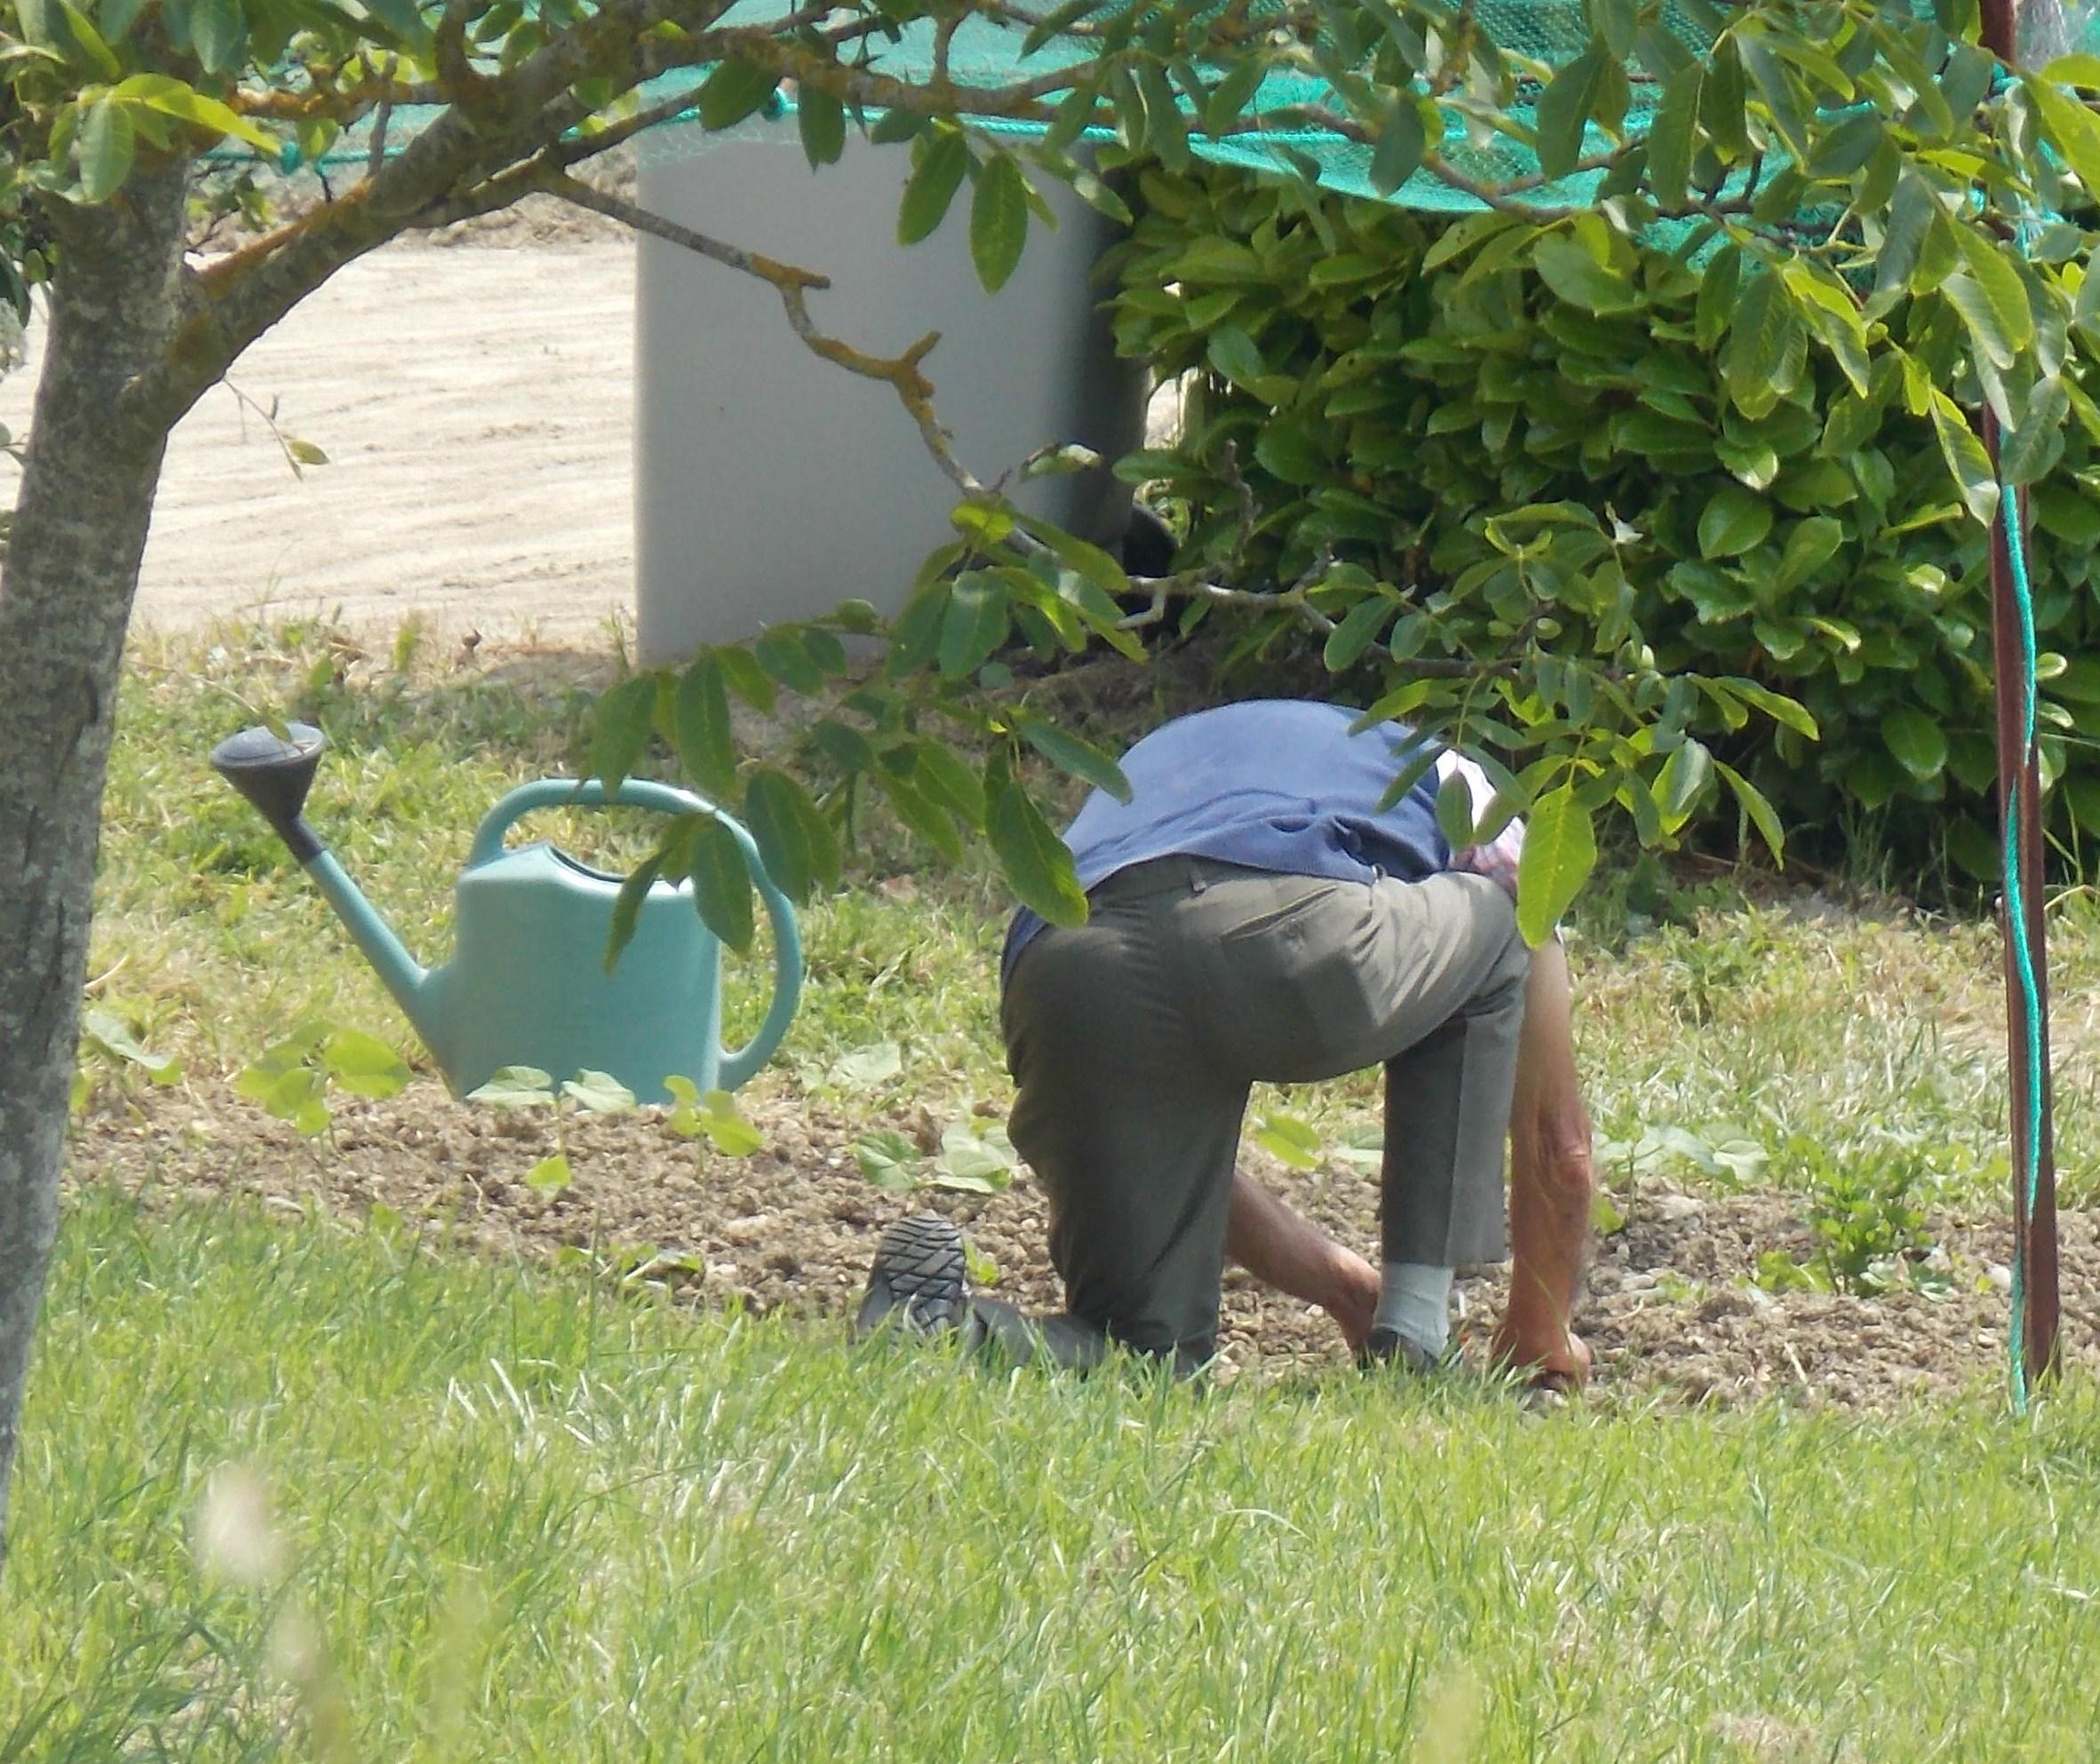 Gardening makes you happy